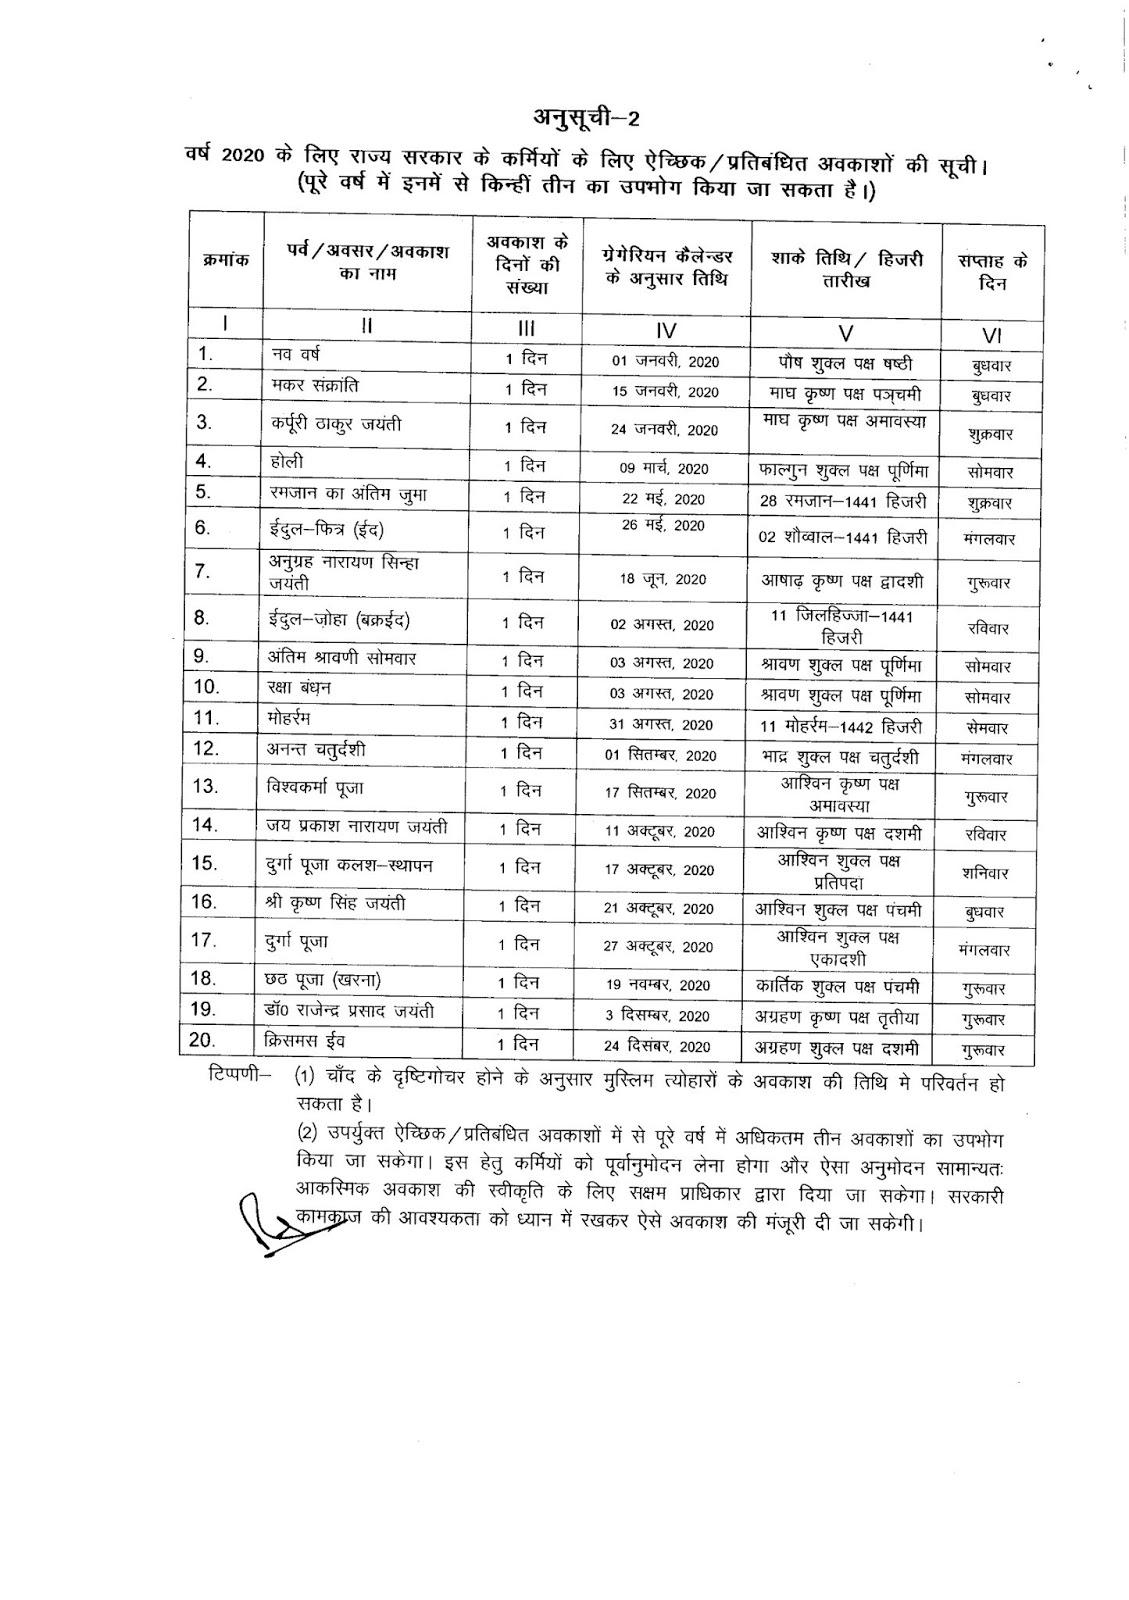 Bihar Government Calendar 2020 #educratsweb inside Bihar Govt 2020 Calendar